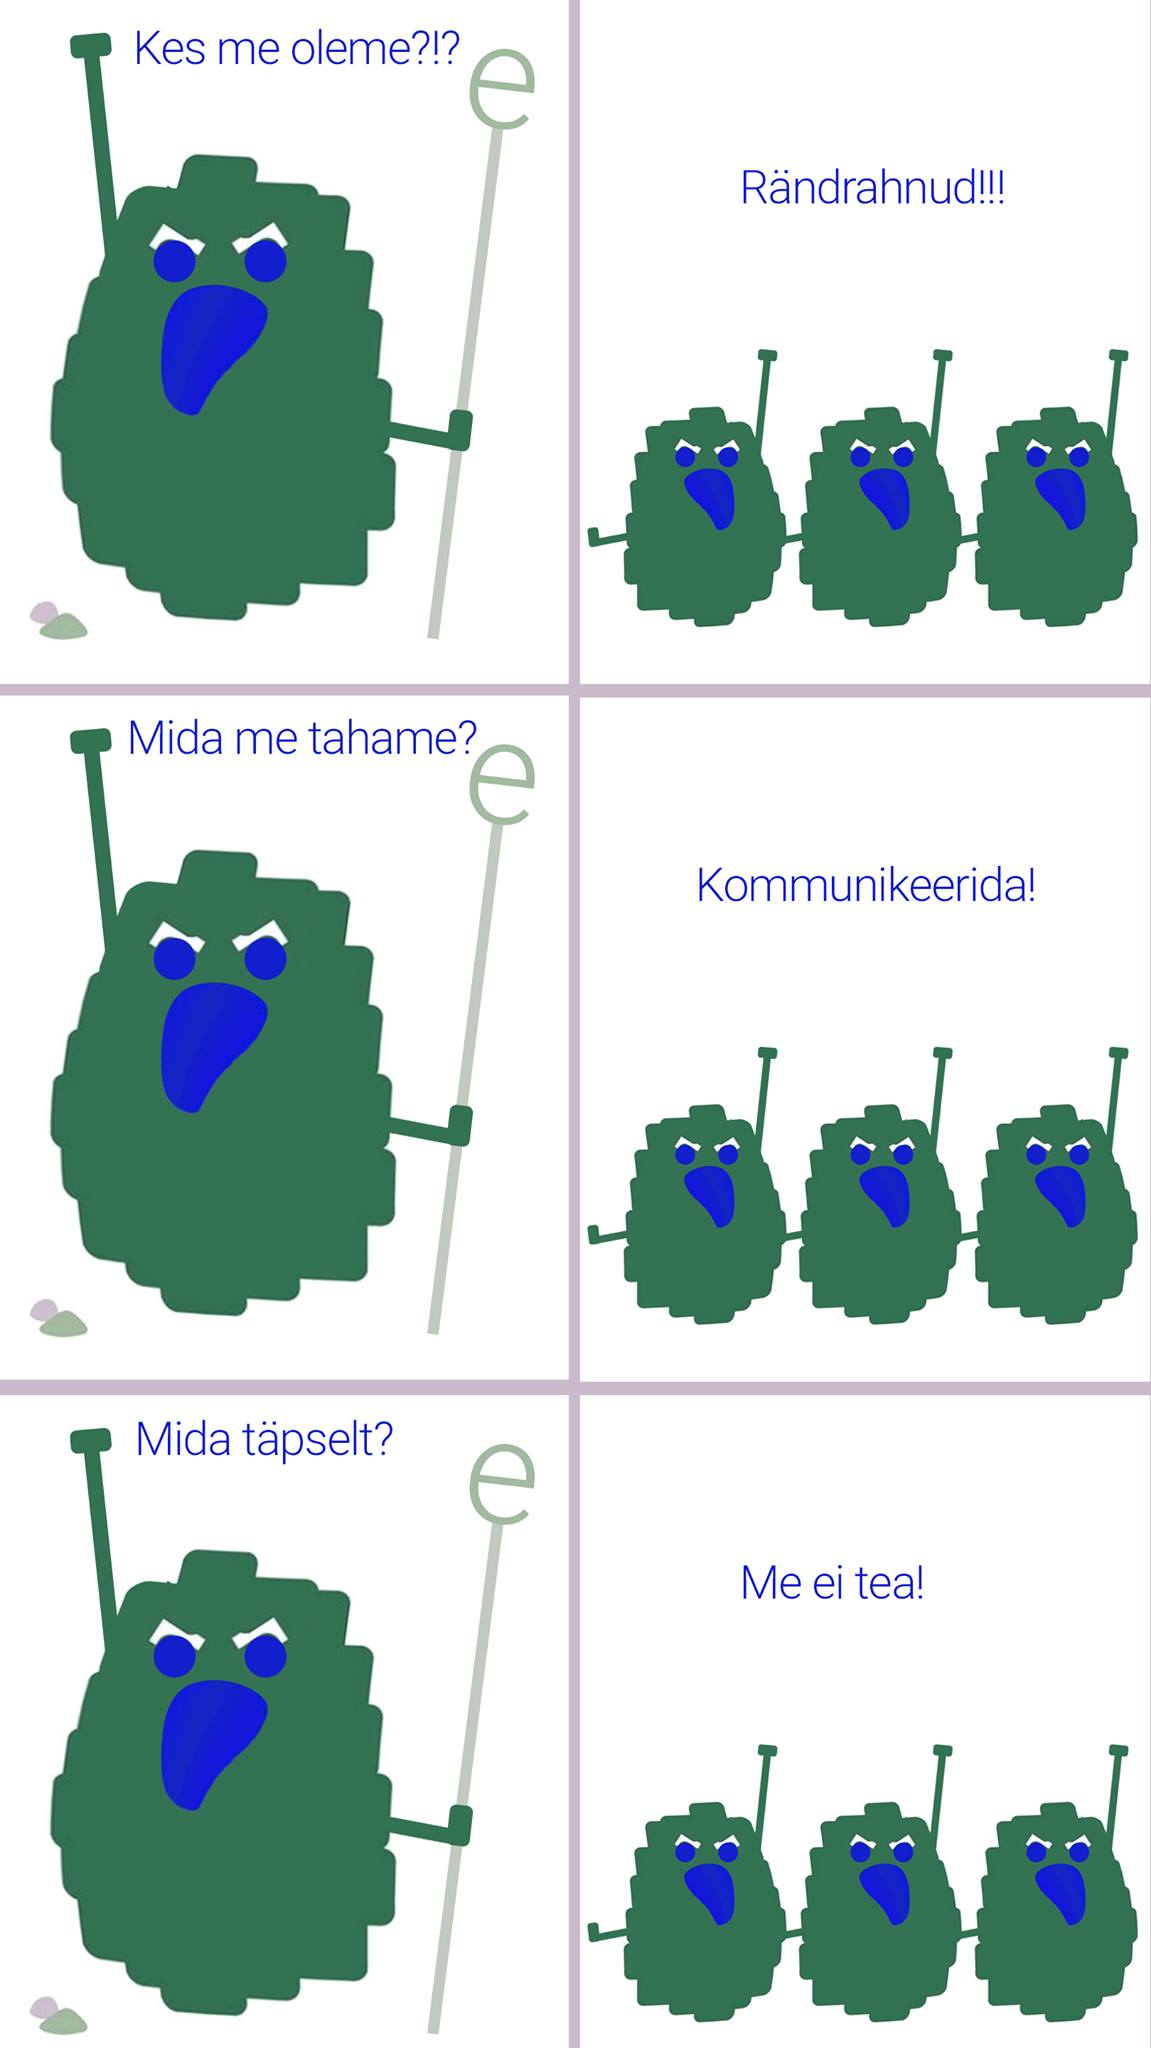 Комикс Карла-Кристиана Фрея про эстонский валун